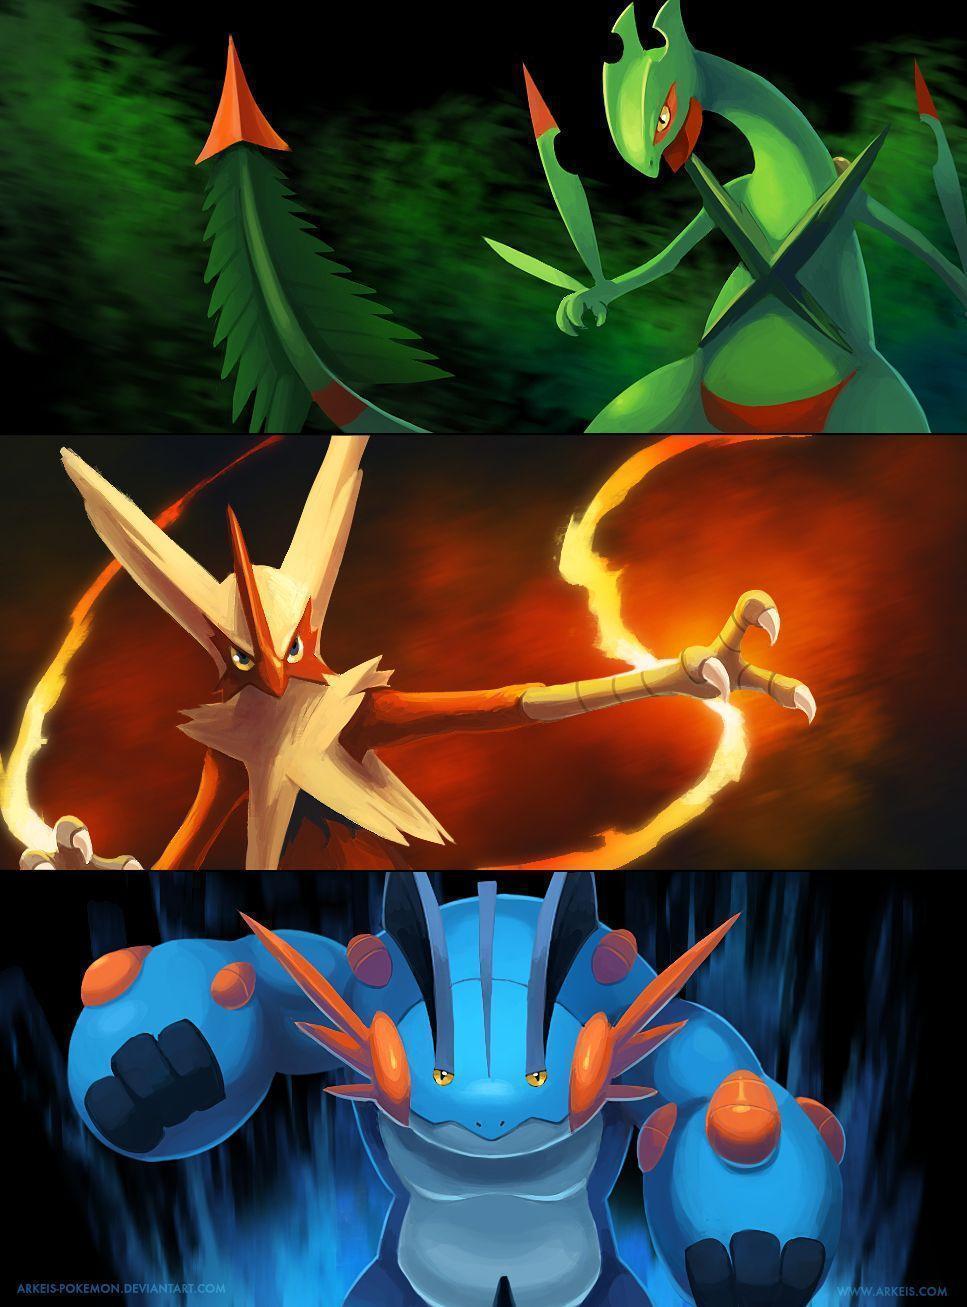 Mega blaziken wallpapers wallpaper cave - Pokemon mega evolution blaziken ...